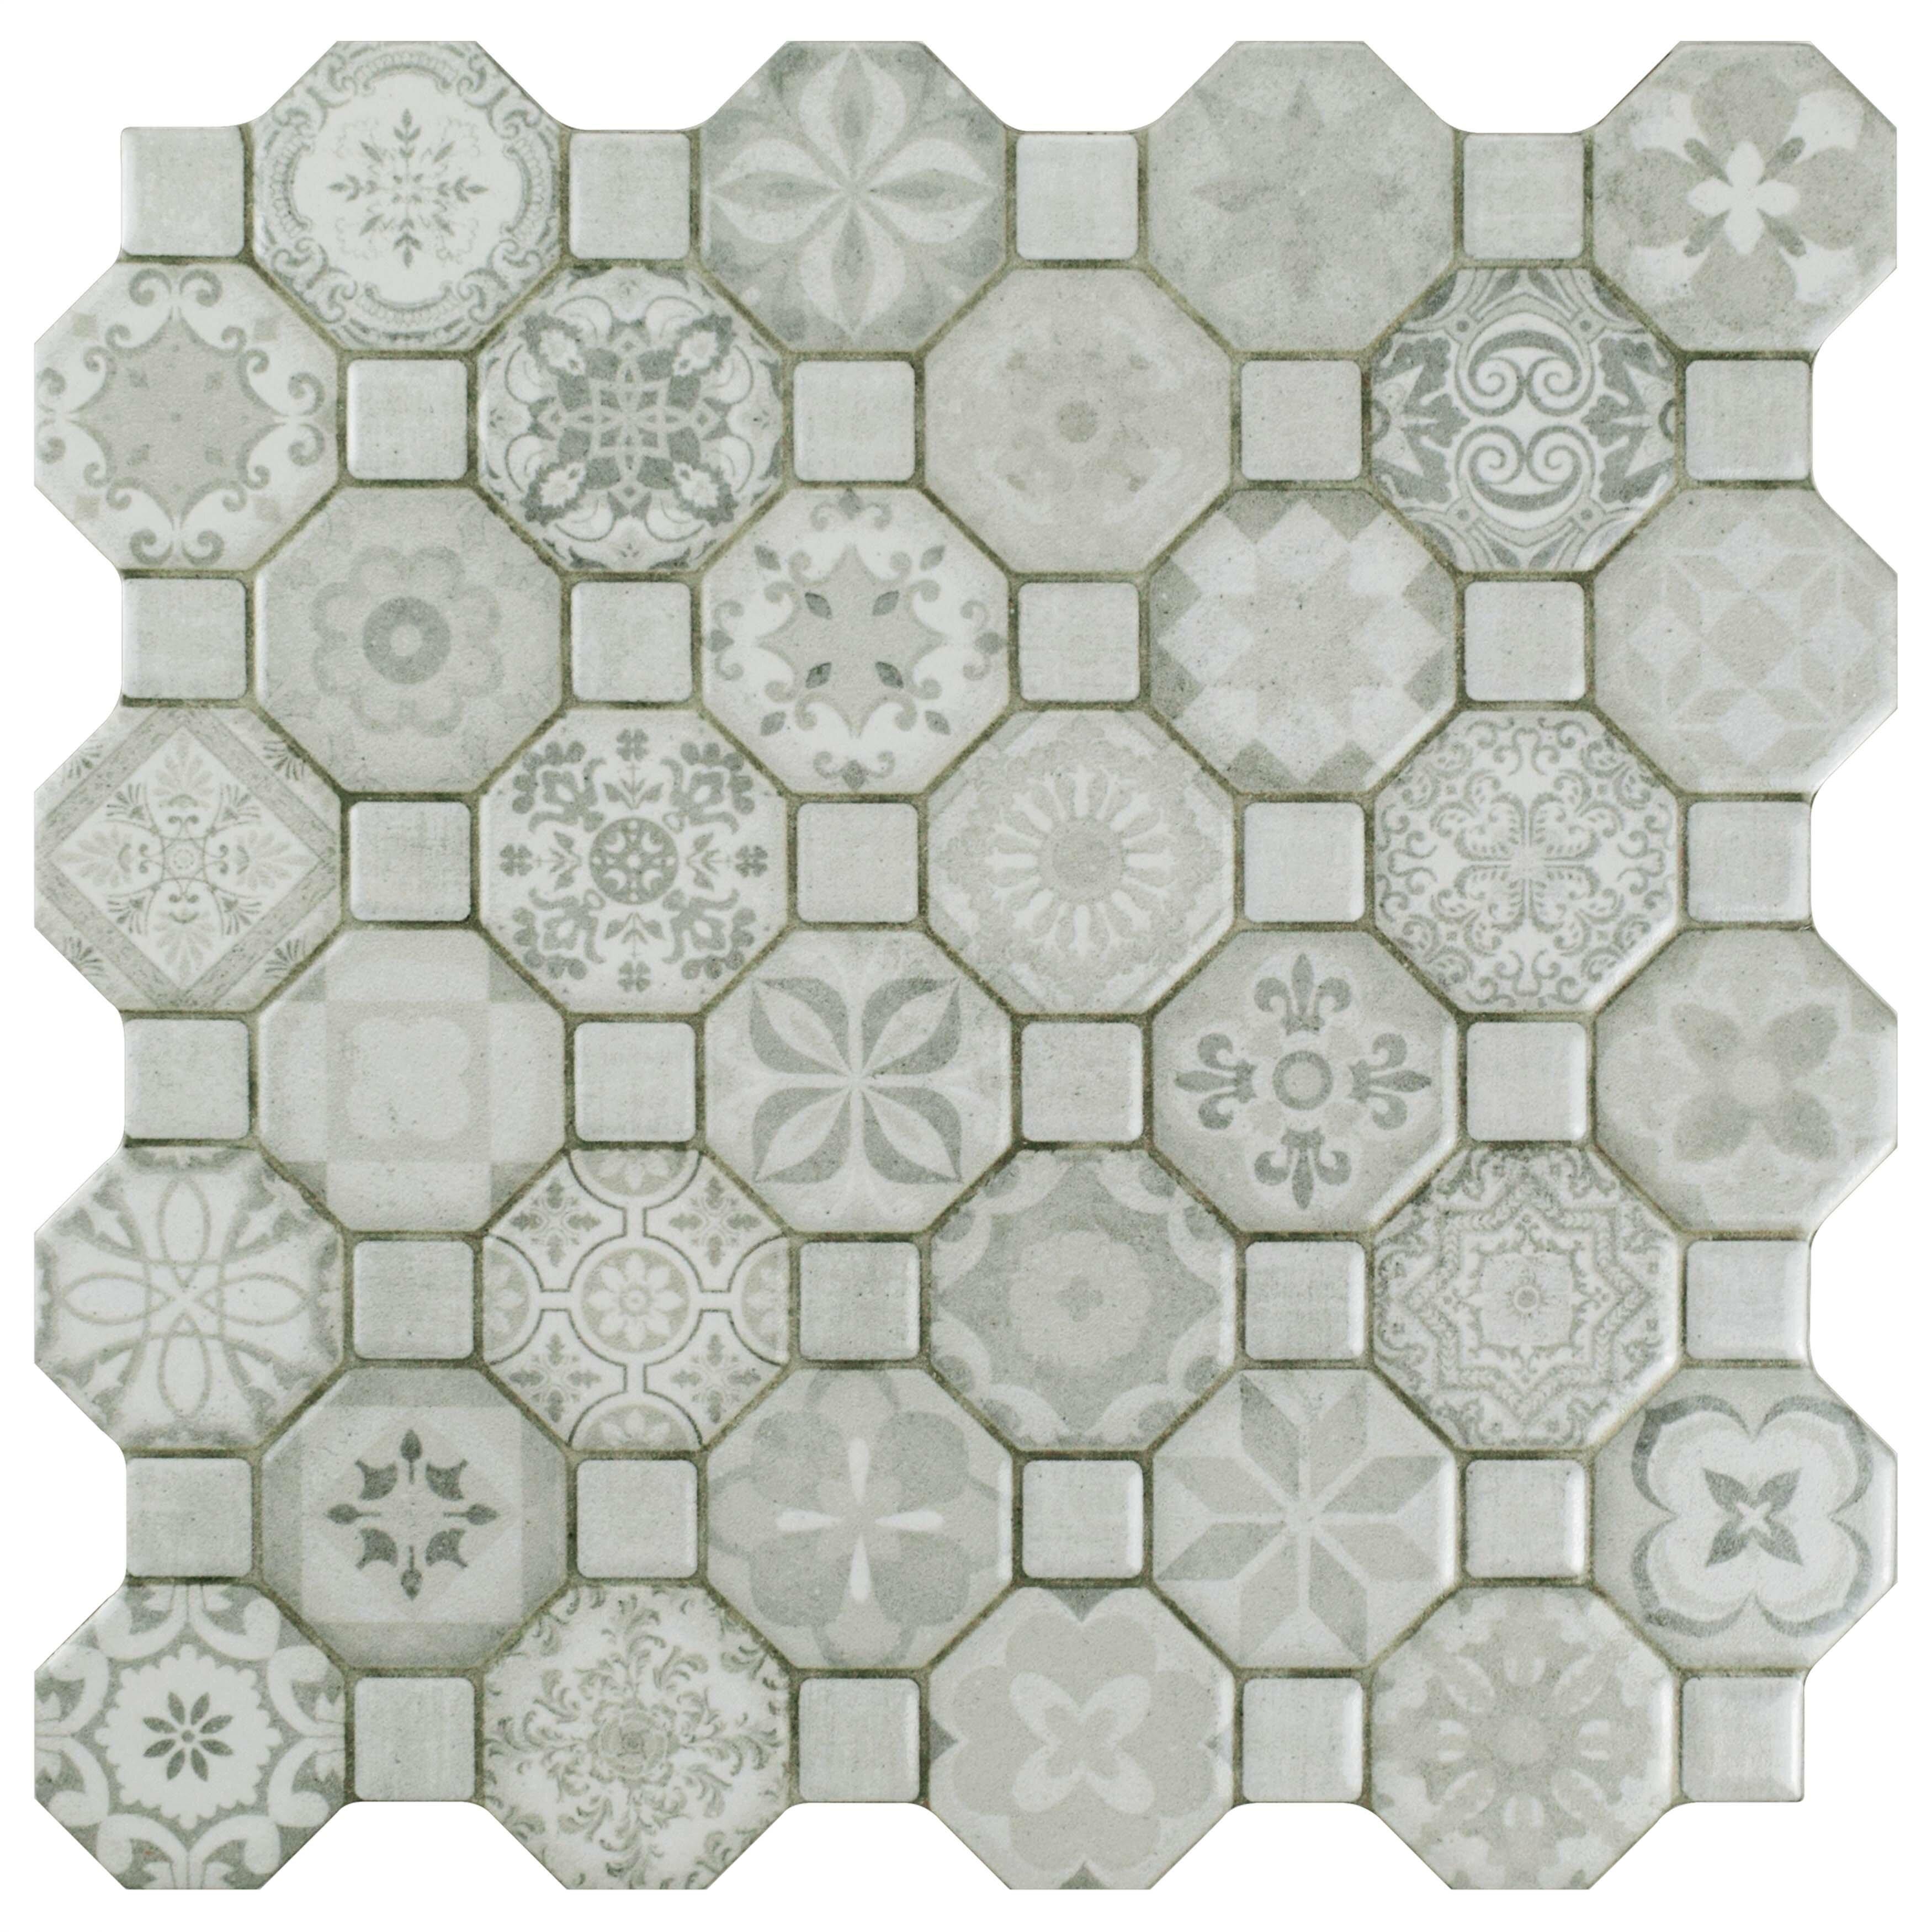 2-Pound Sanded Jennifers Mosaics White Powdered Grout